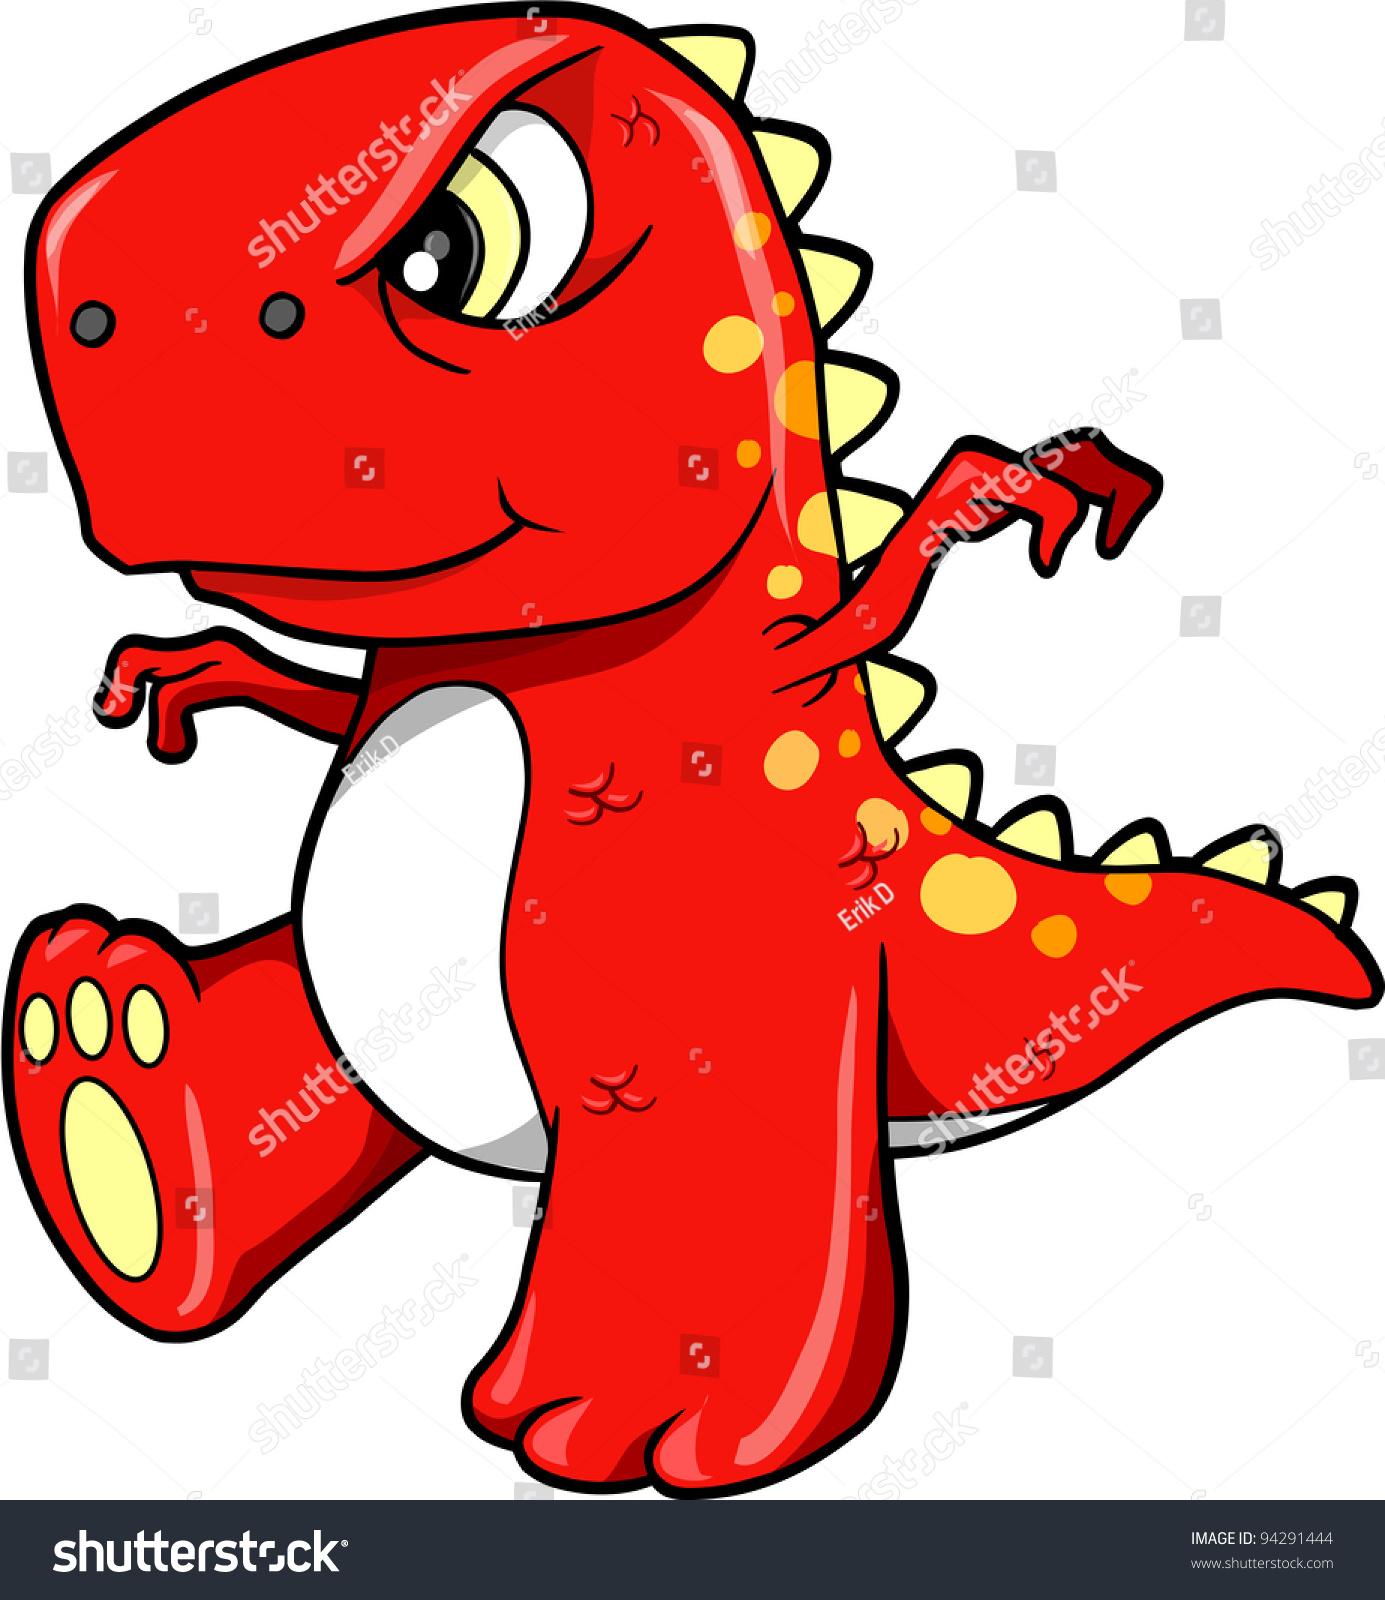 stock-vector-angry-mean-red-dinosaur-t-rex-vector-illustration-art-94291444.jpg